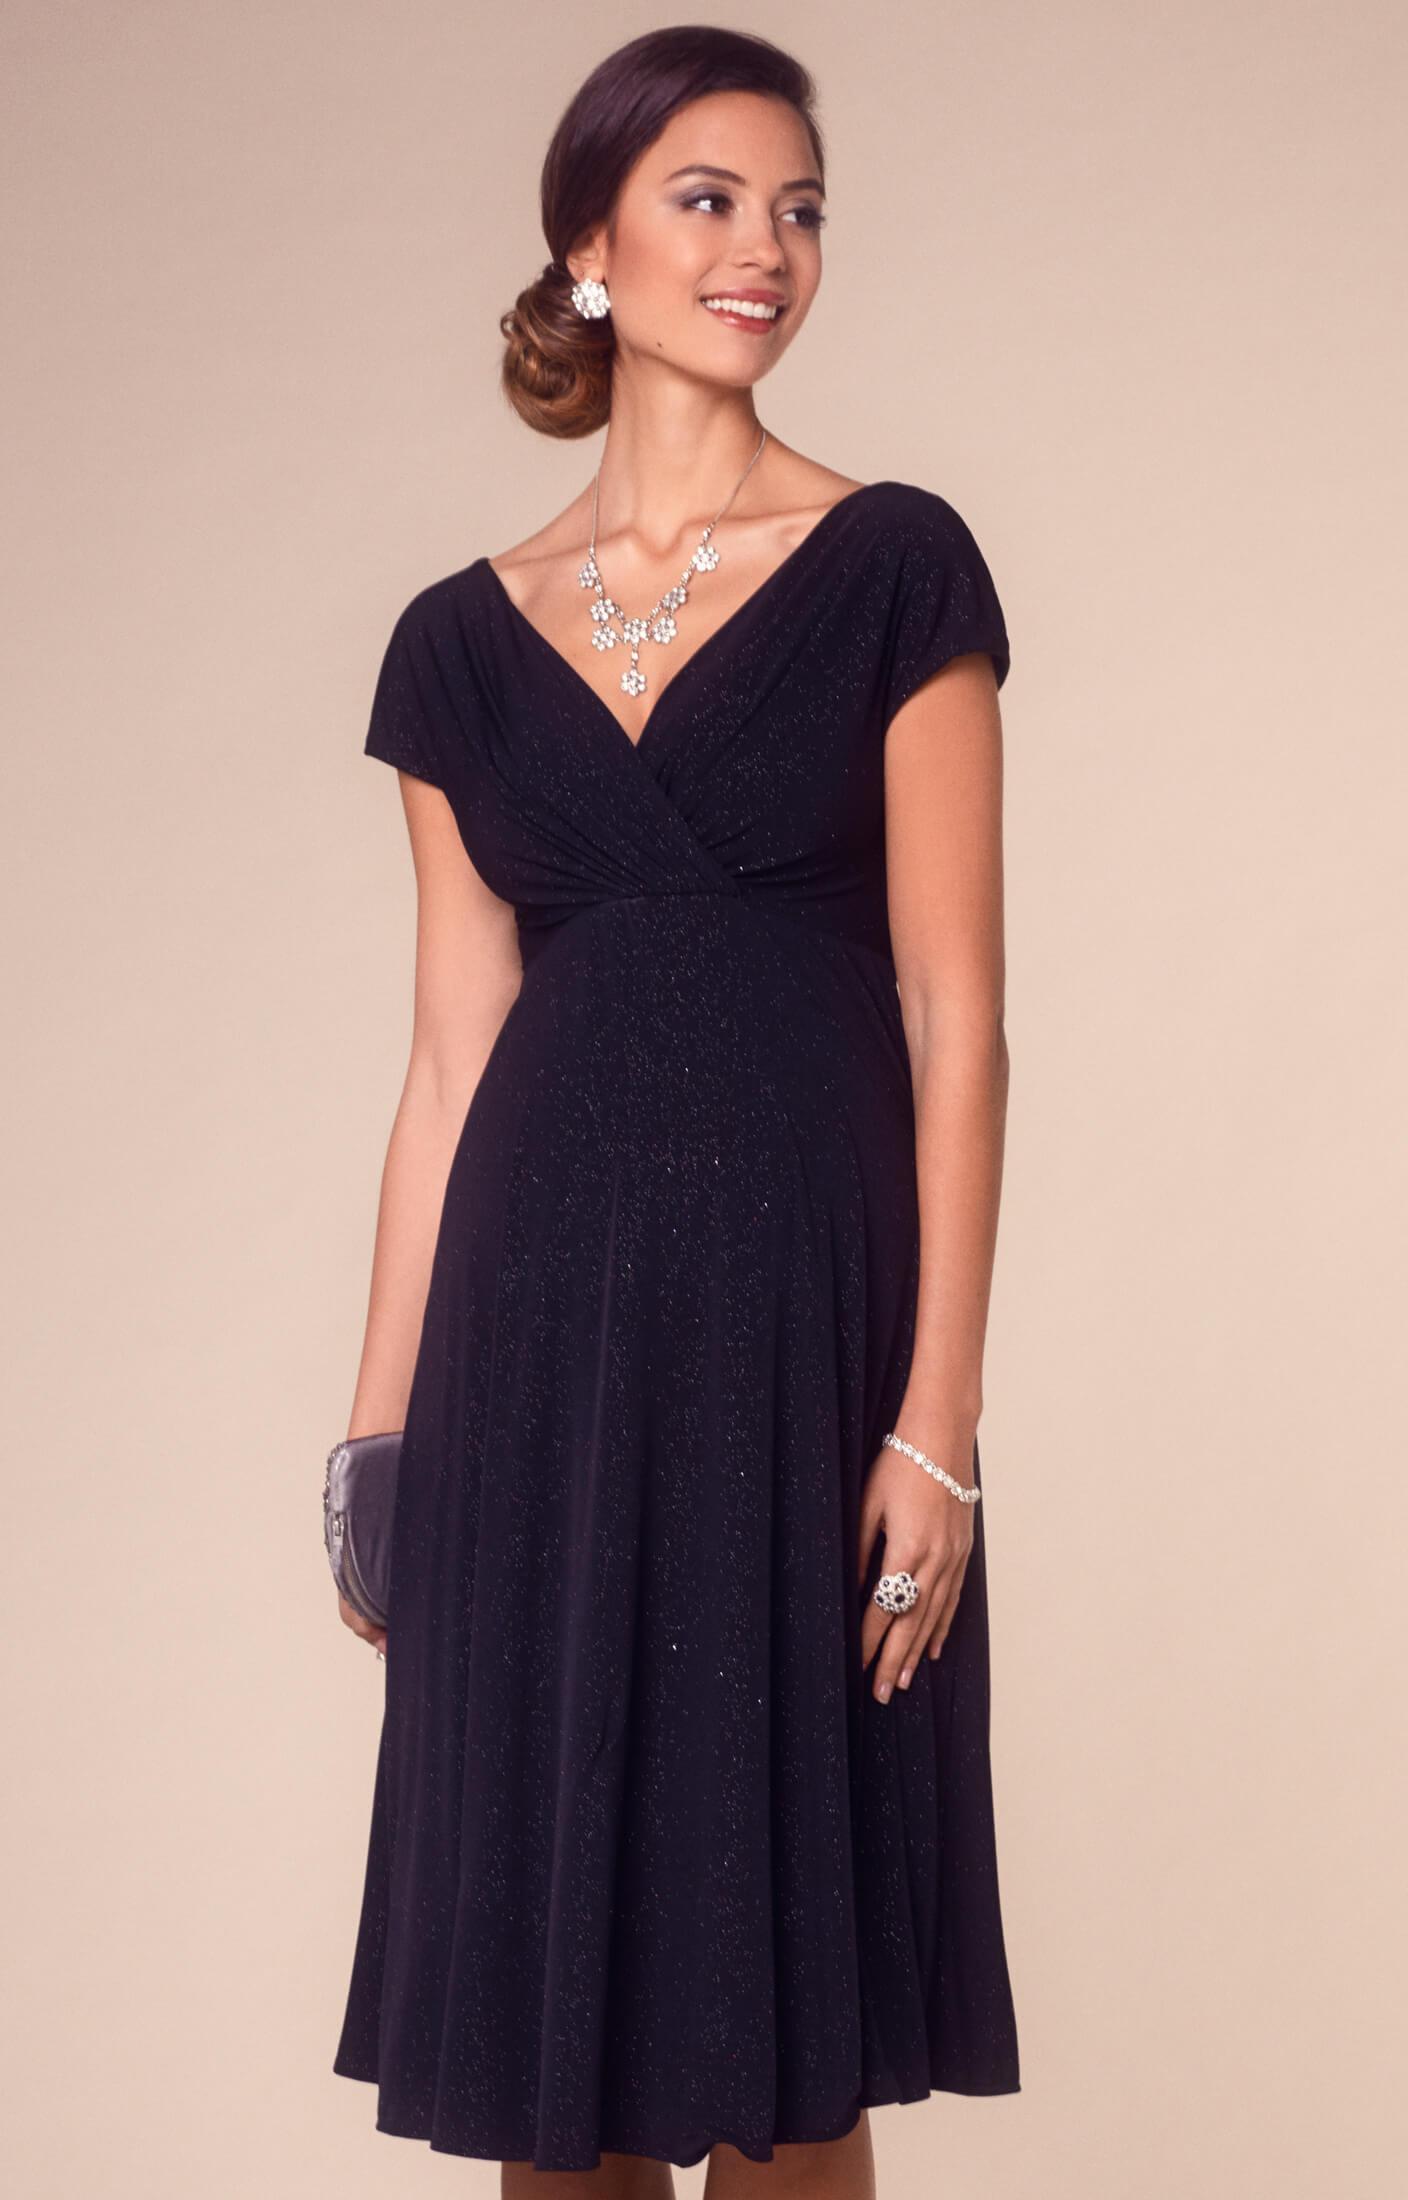 49cb415a8e0 Alessandra Maternity Dress Short Night Sky - Maternity Wedding Dresses